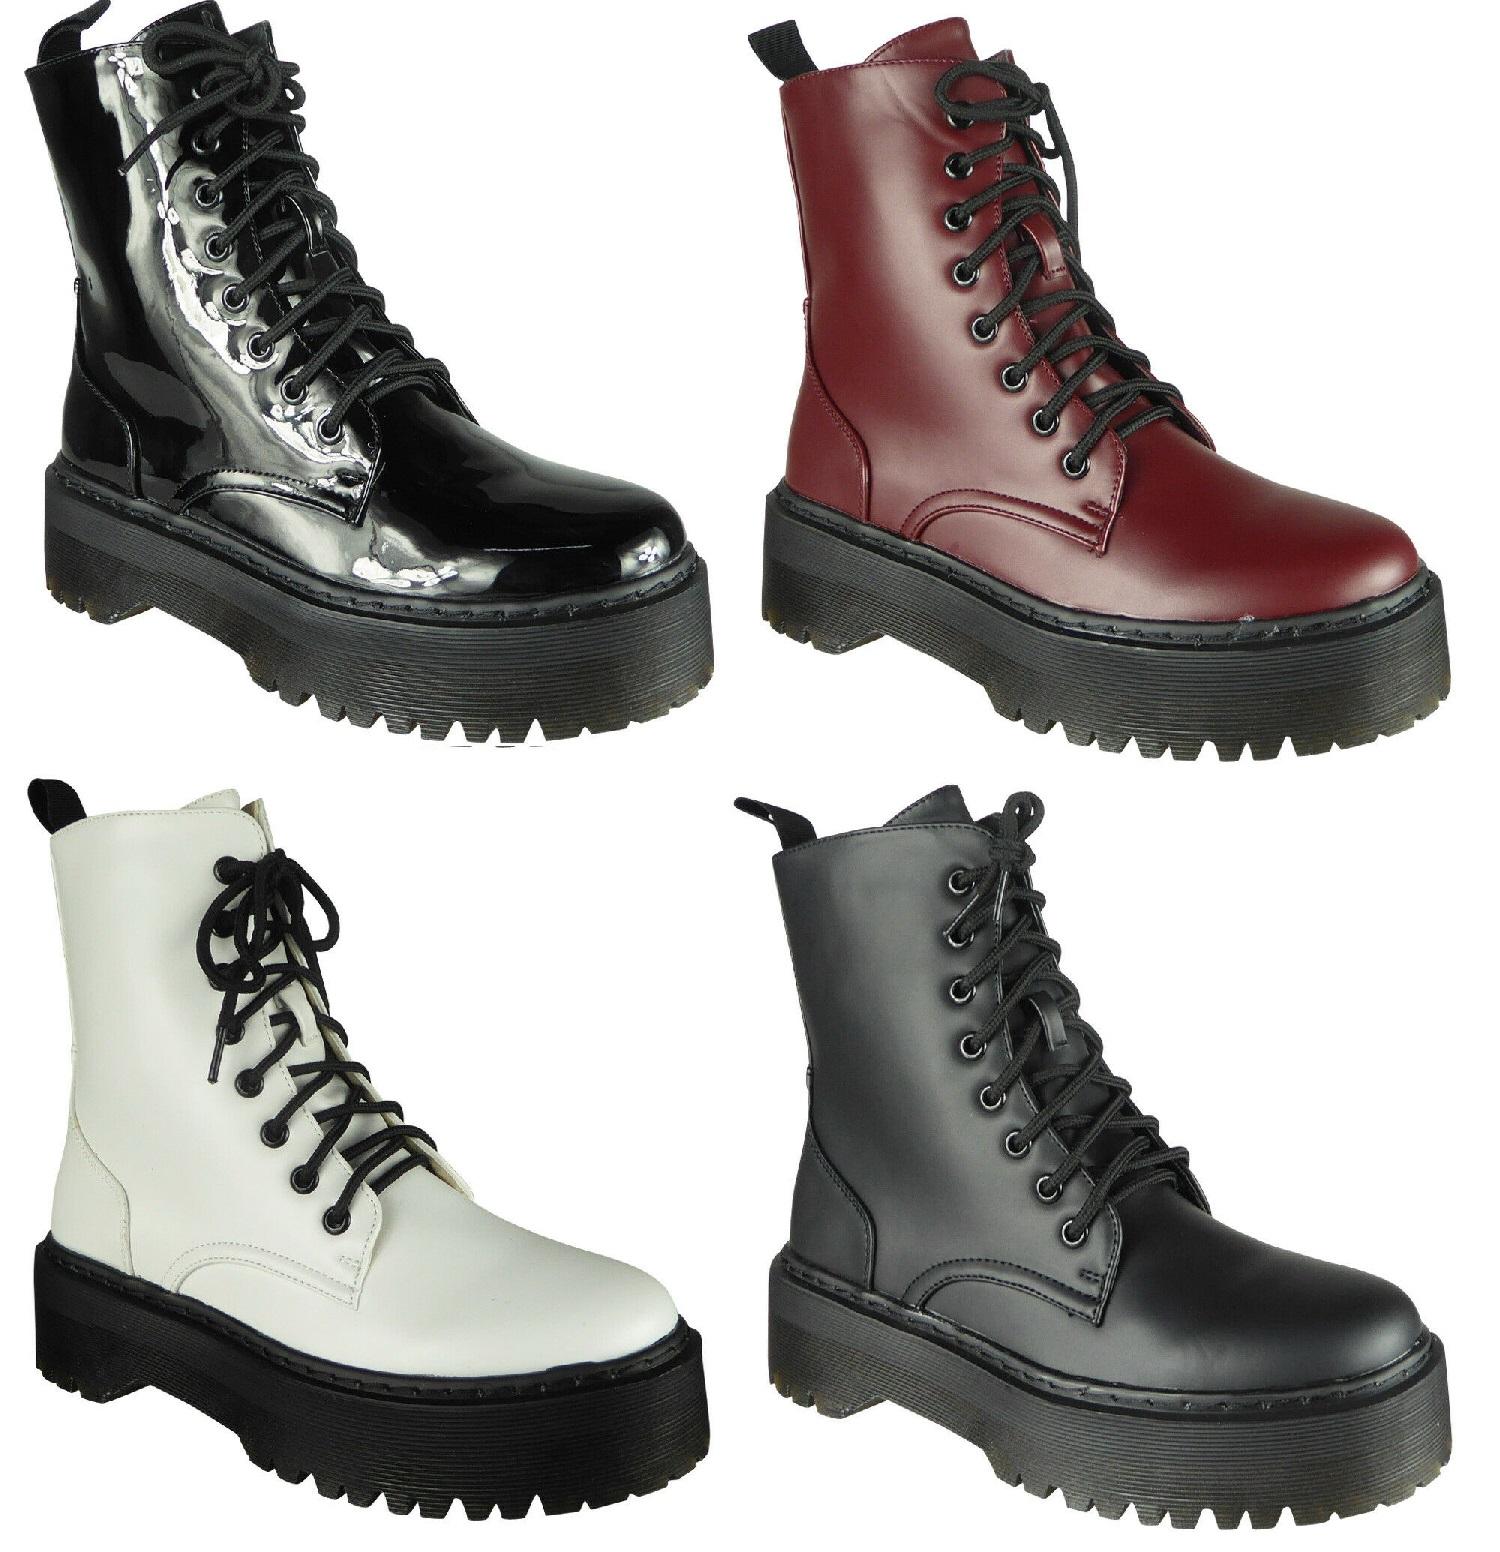 Scarpe punk a stivali e stivaletti da donna | Acquisti